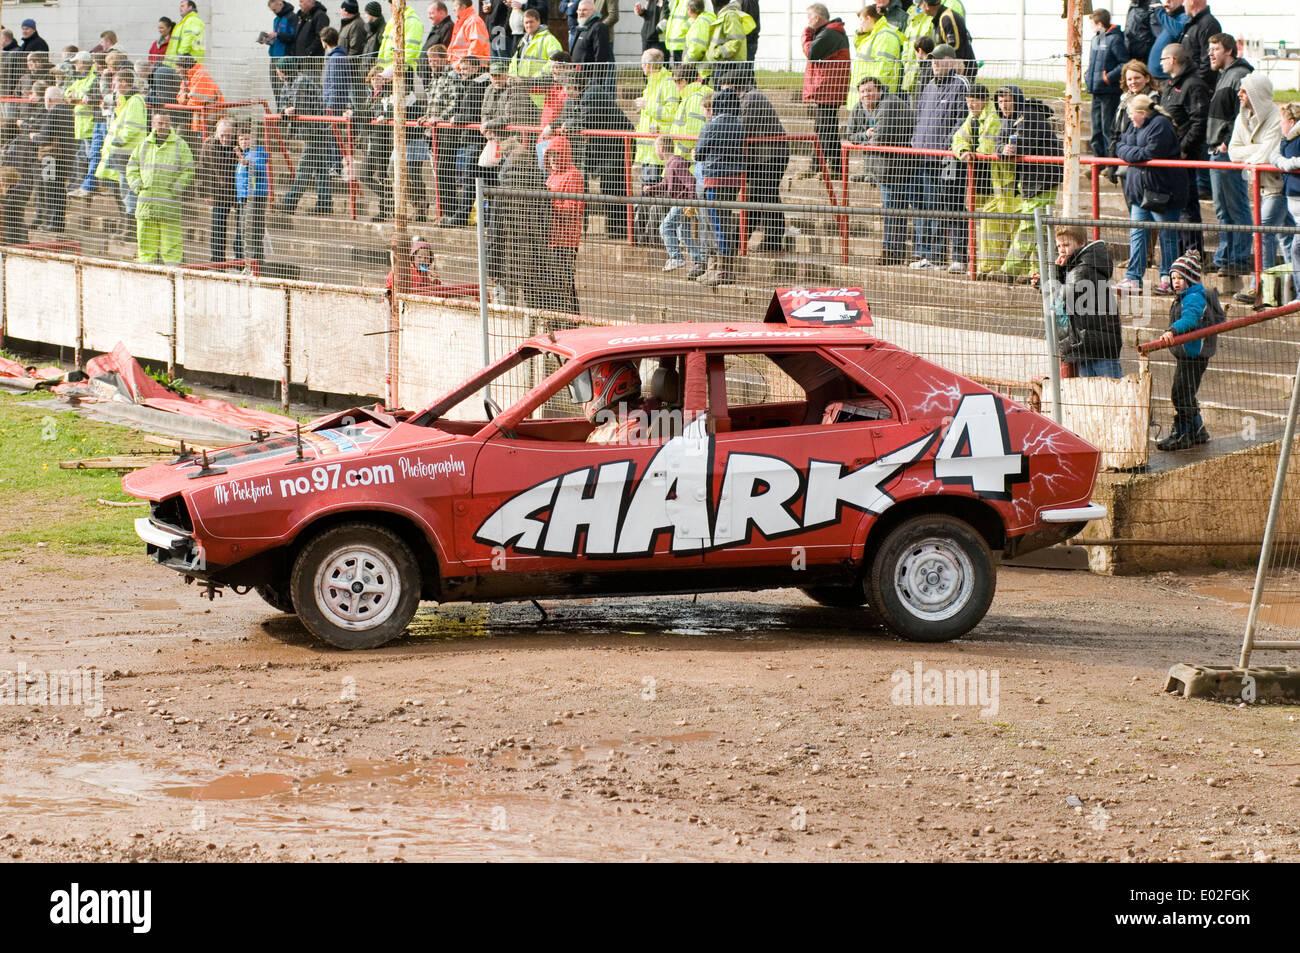 Race Car Junk >> austin princess car cars bl british leyland rubbish junk scrap banger Stock Photo: 68897603 - Alamy